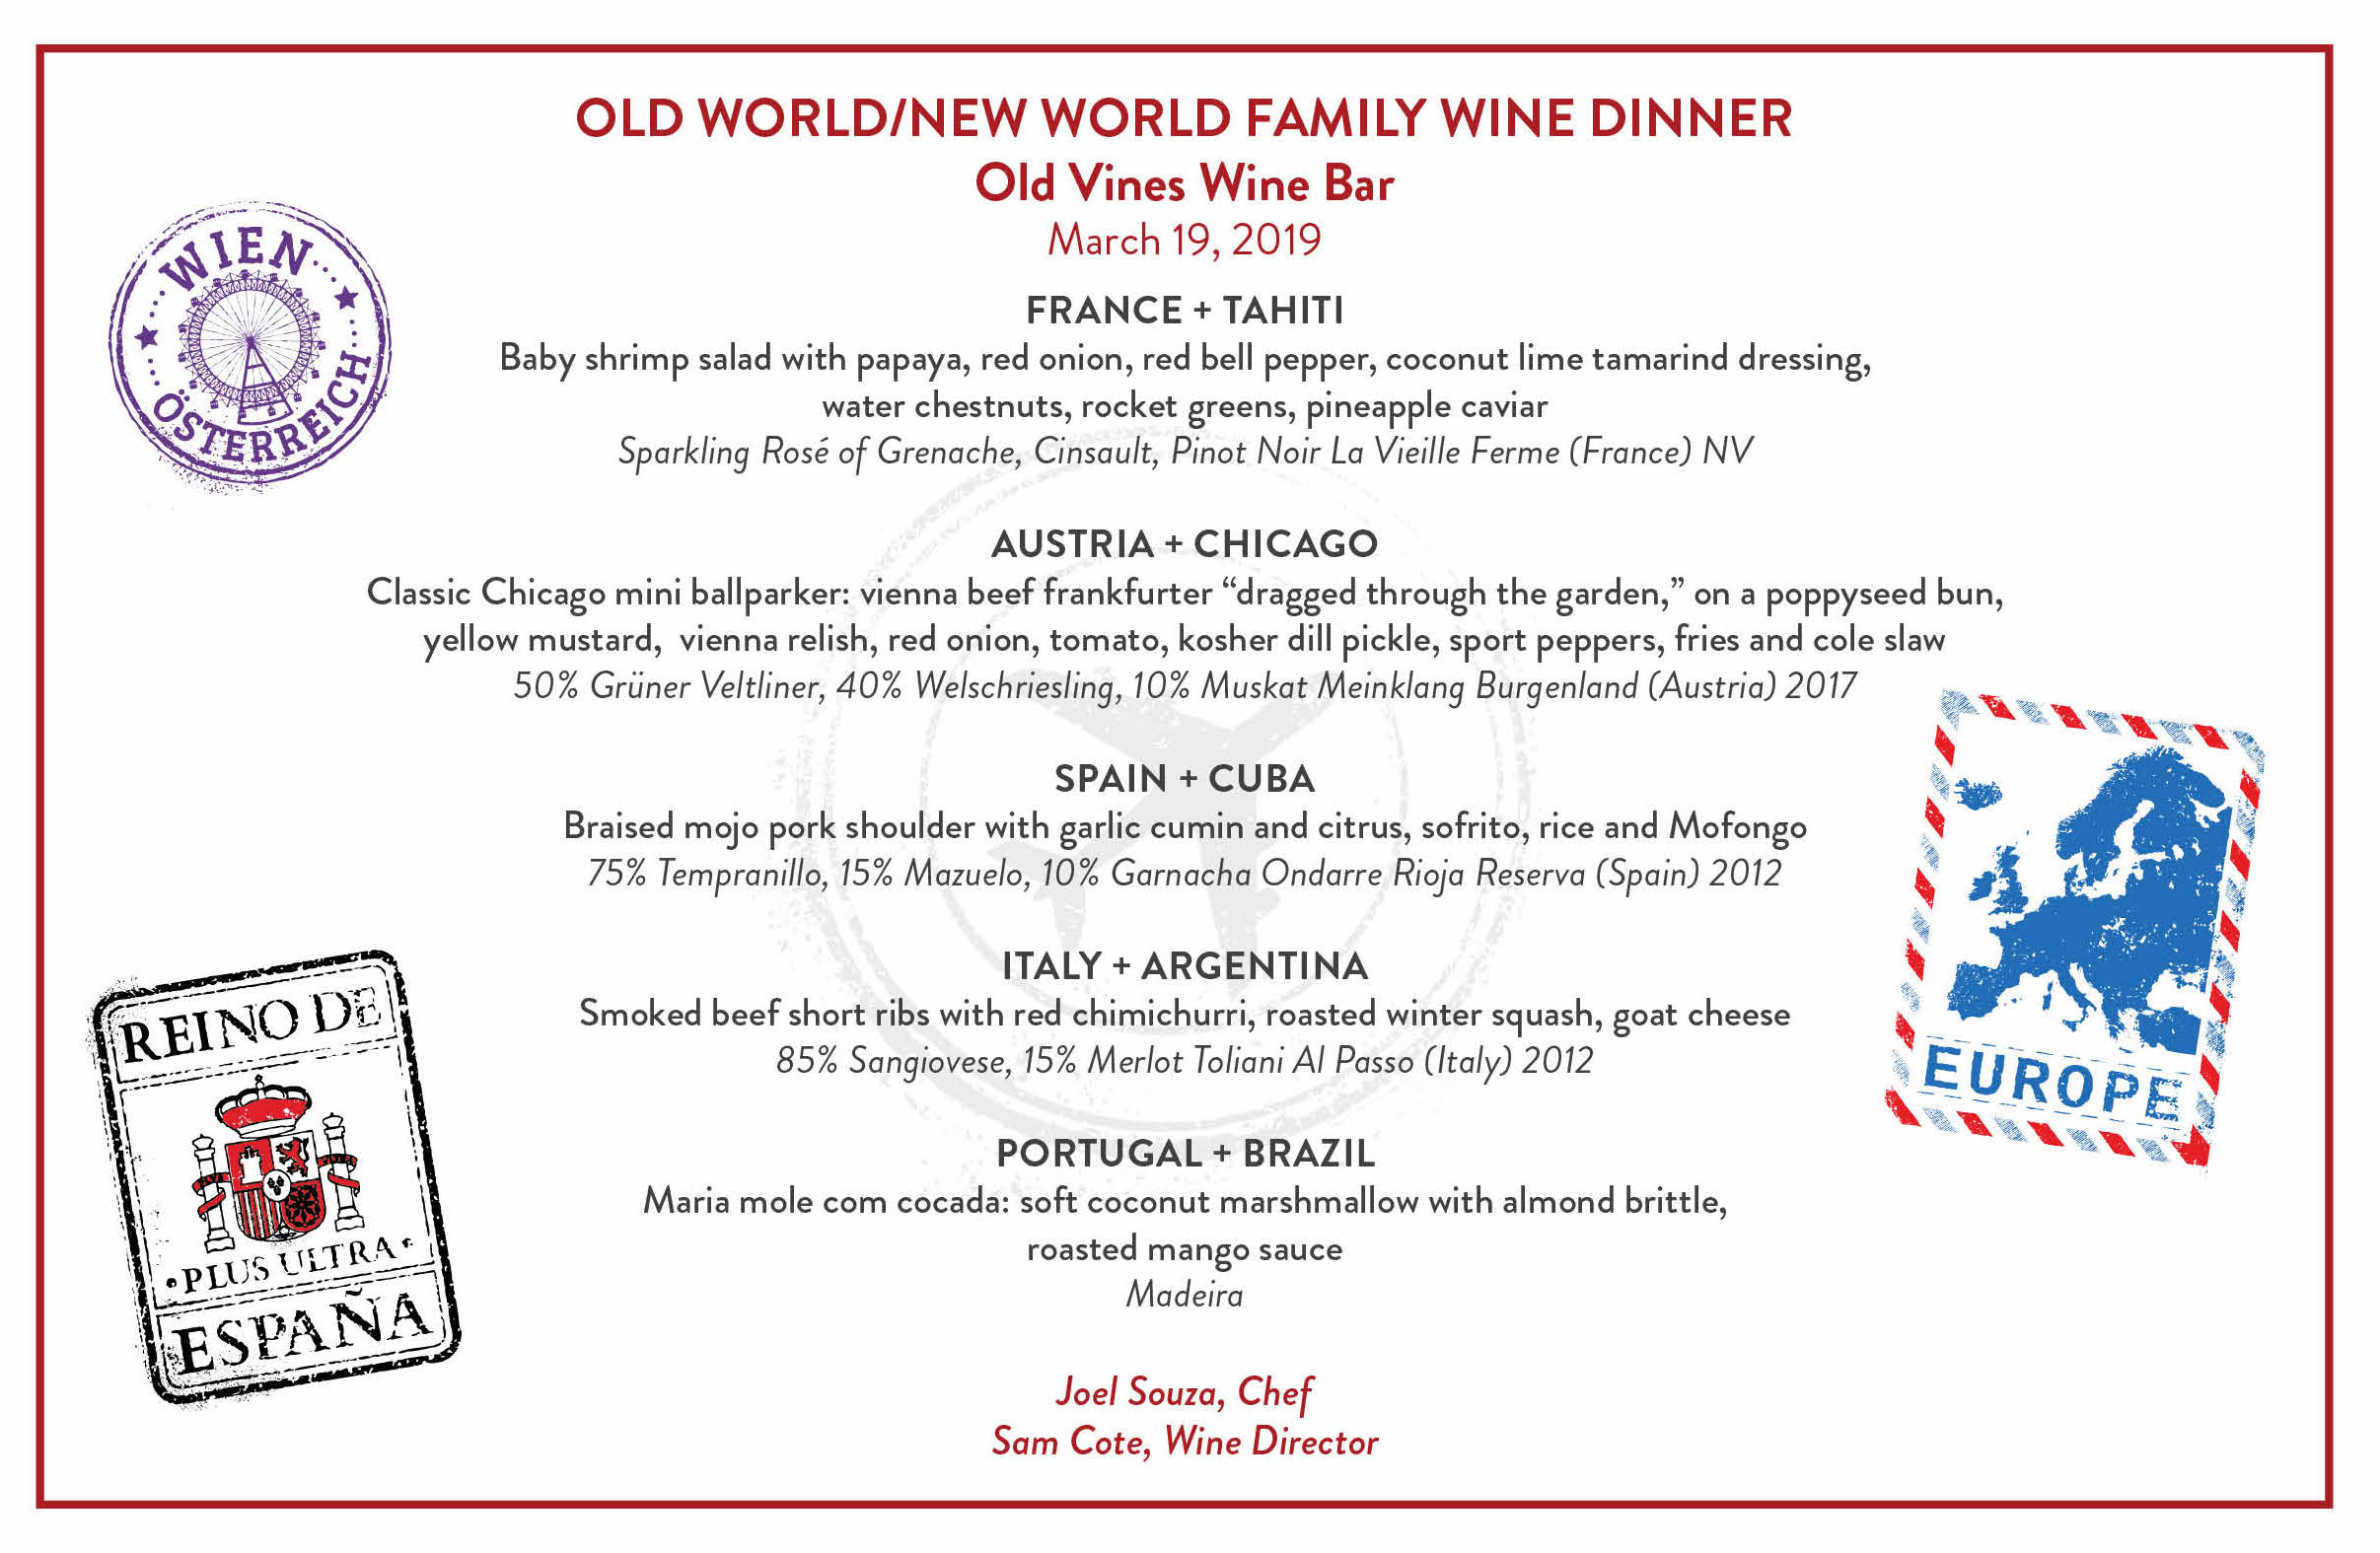 2019 Old World New World dinner menu.jpg